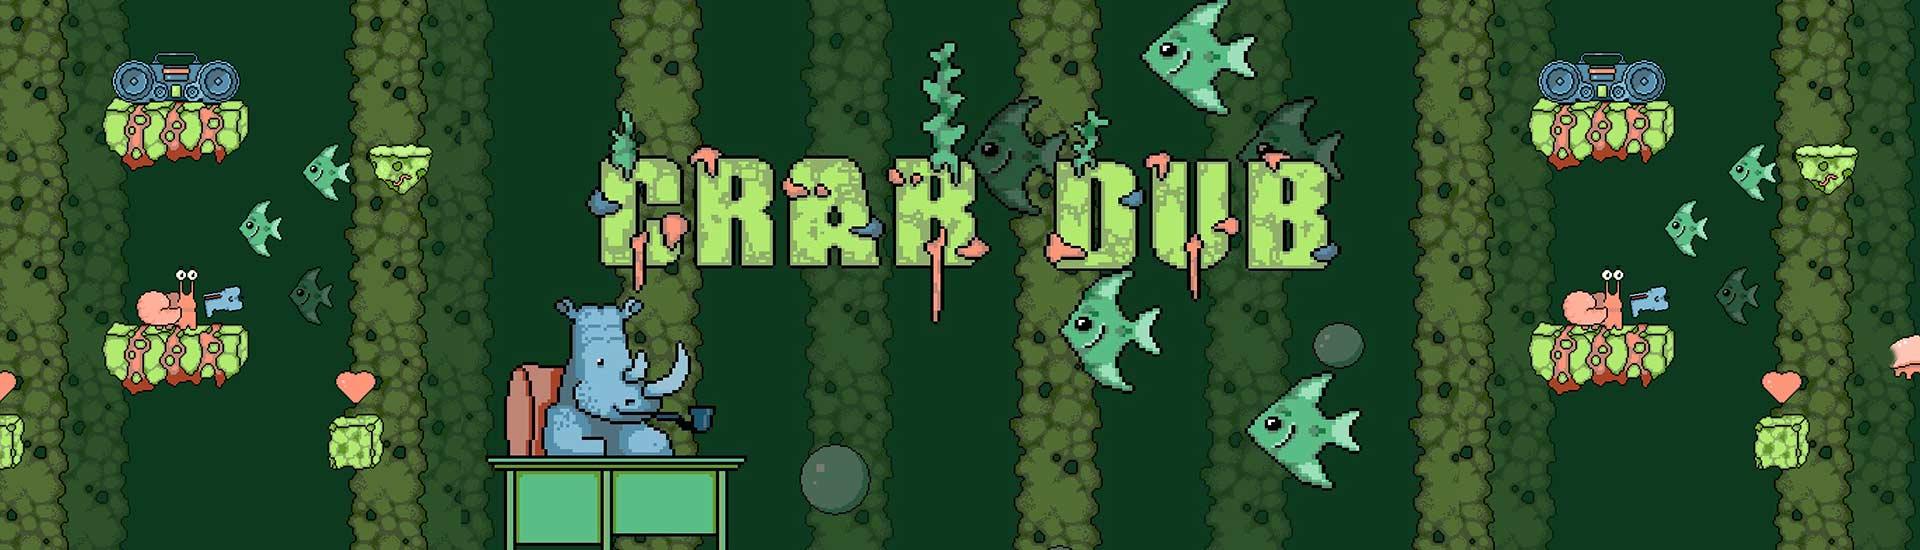 Gratis game Crab Dub @Indiegala